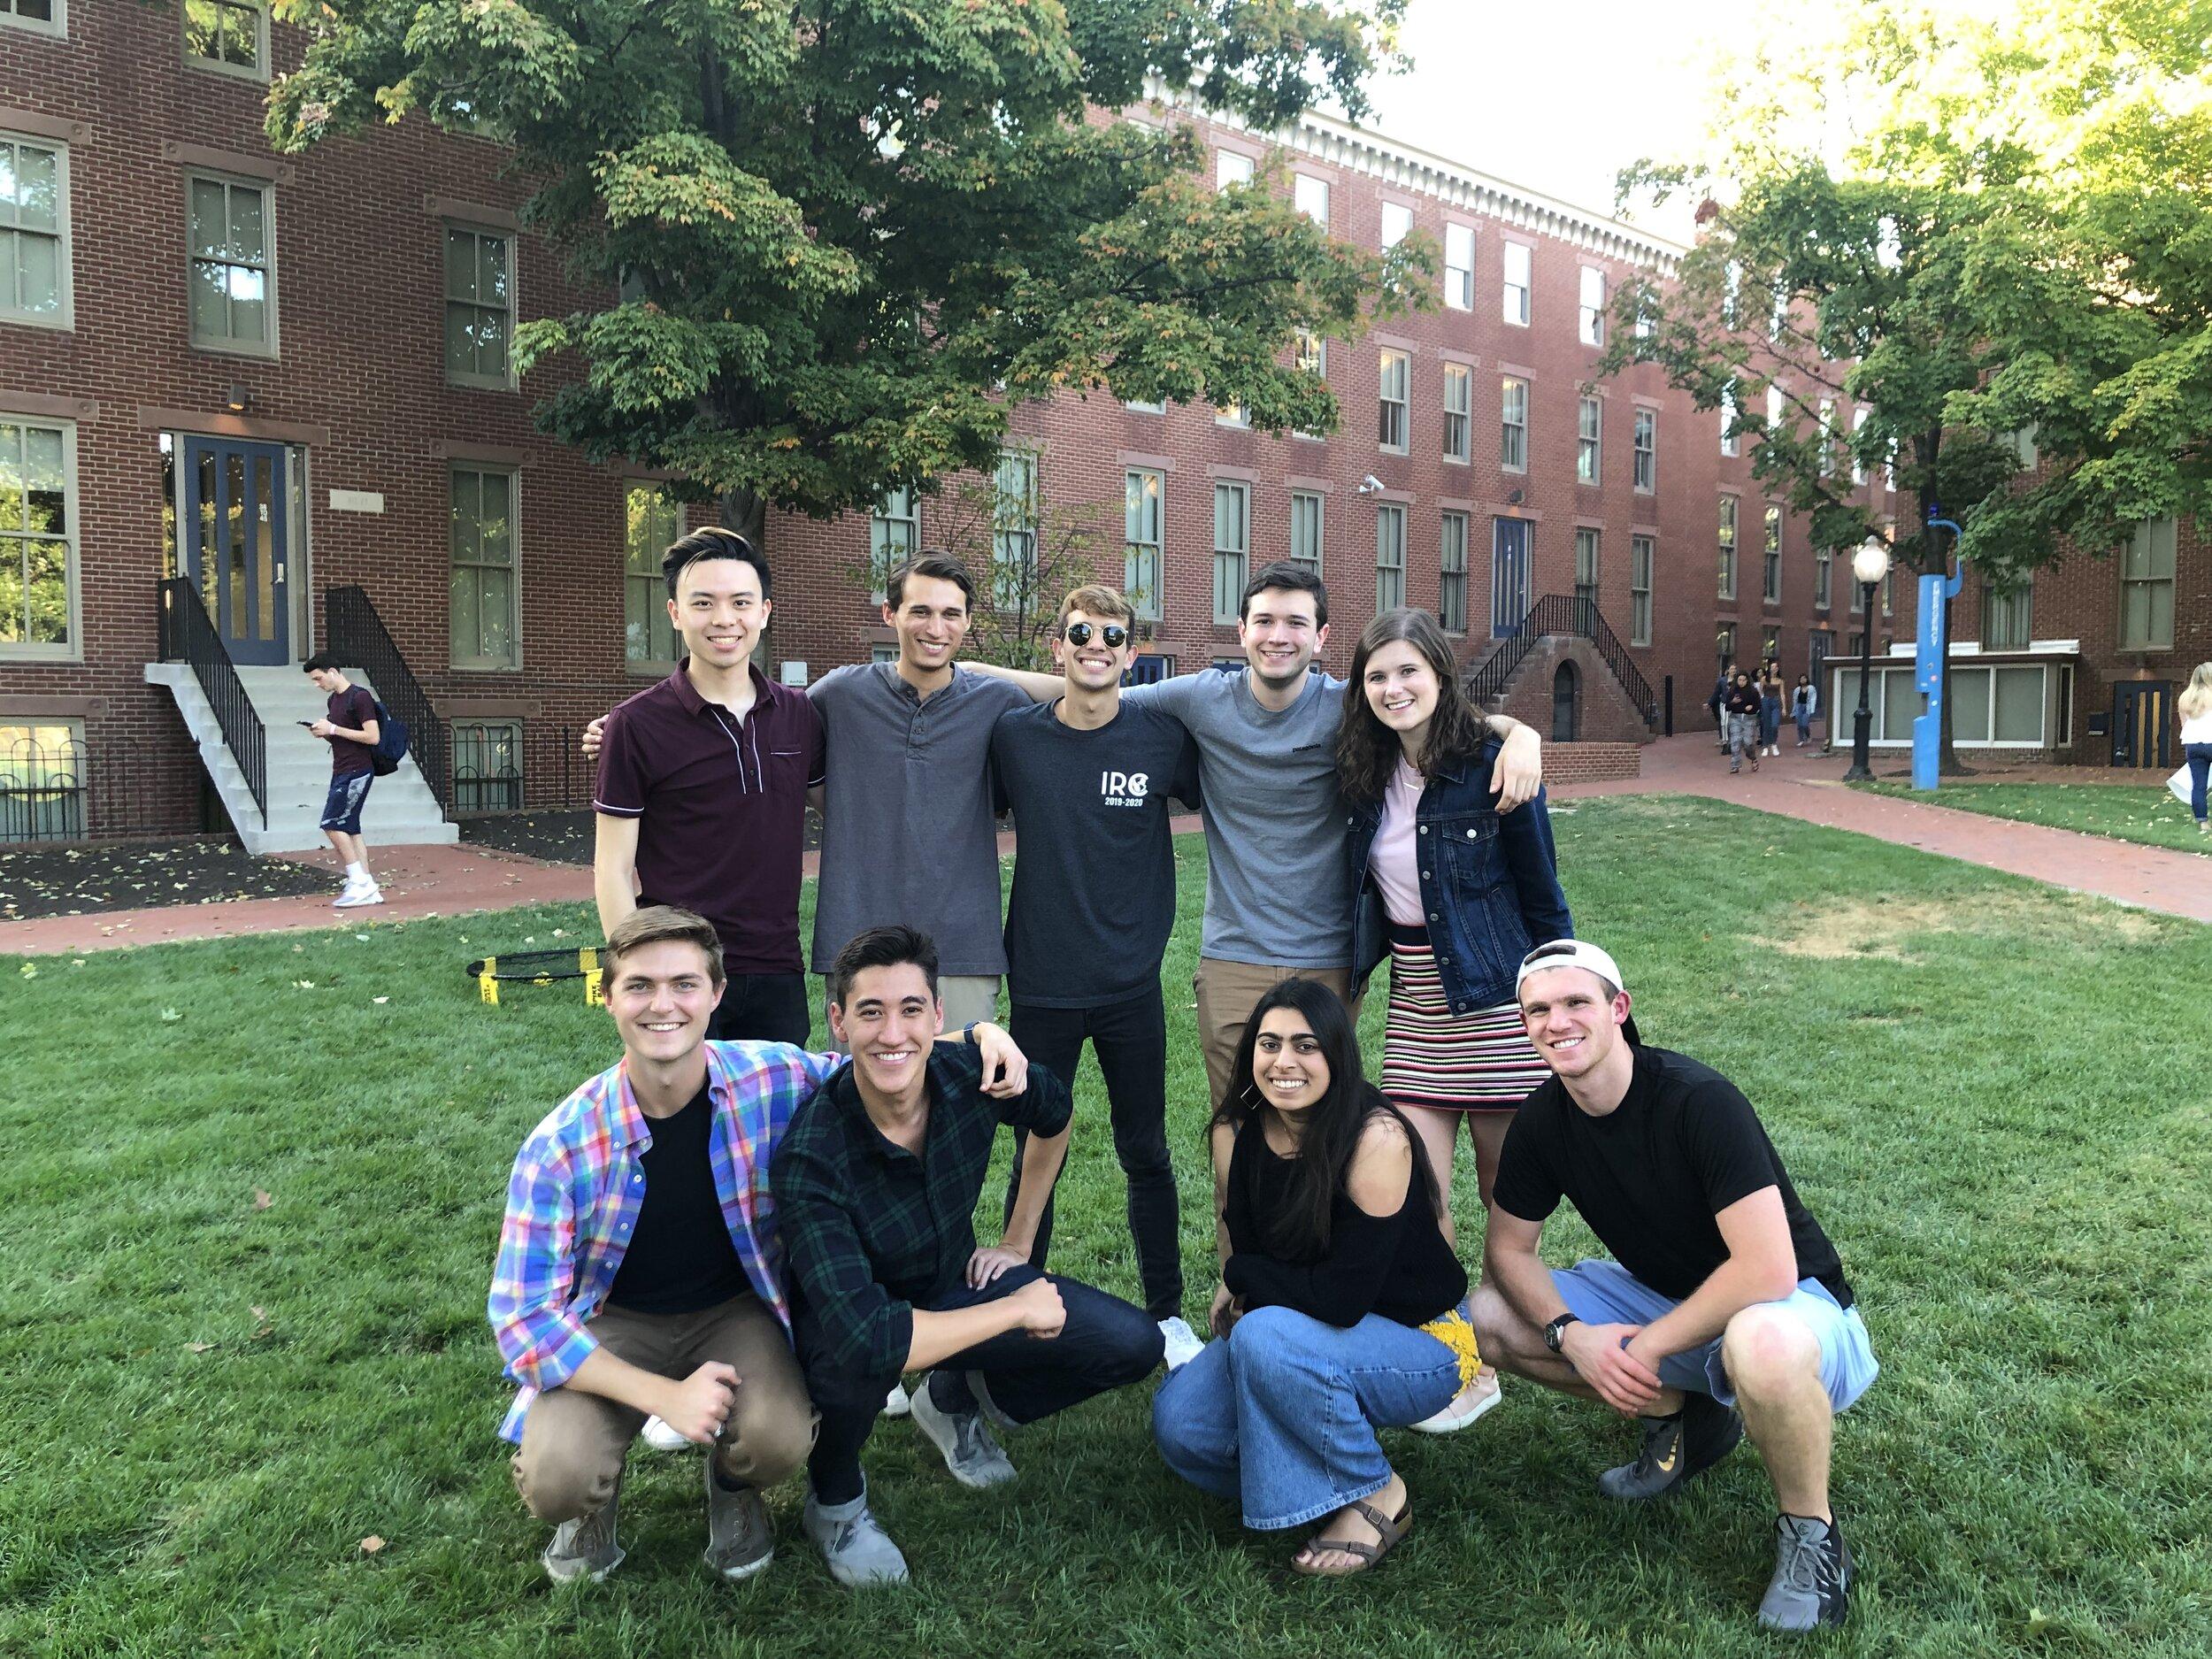 IRC Homecoming Alumni BBQ - October 11, 2019